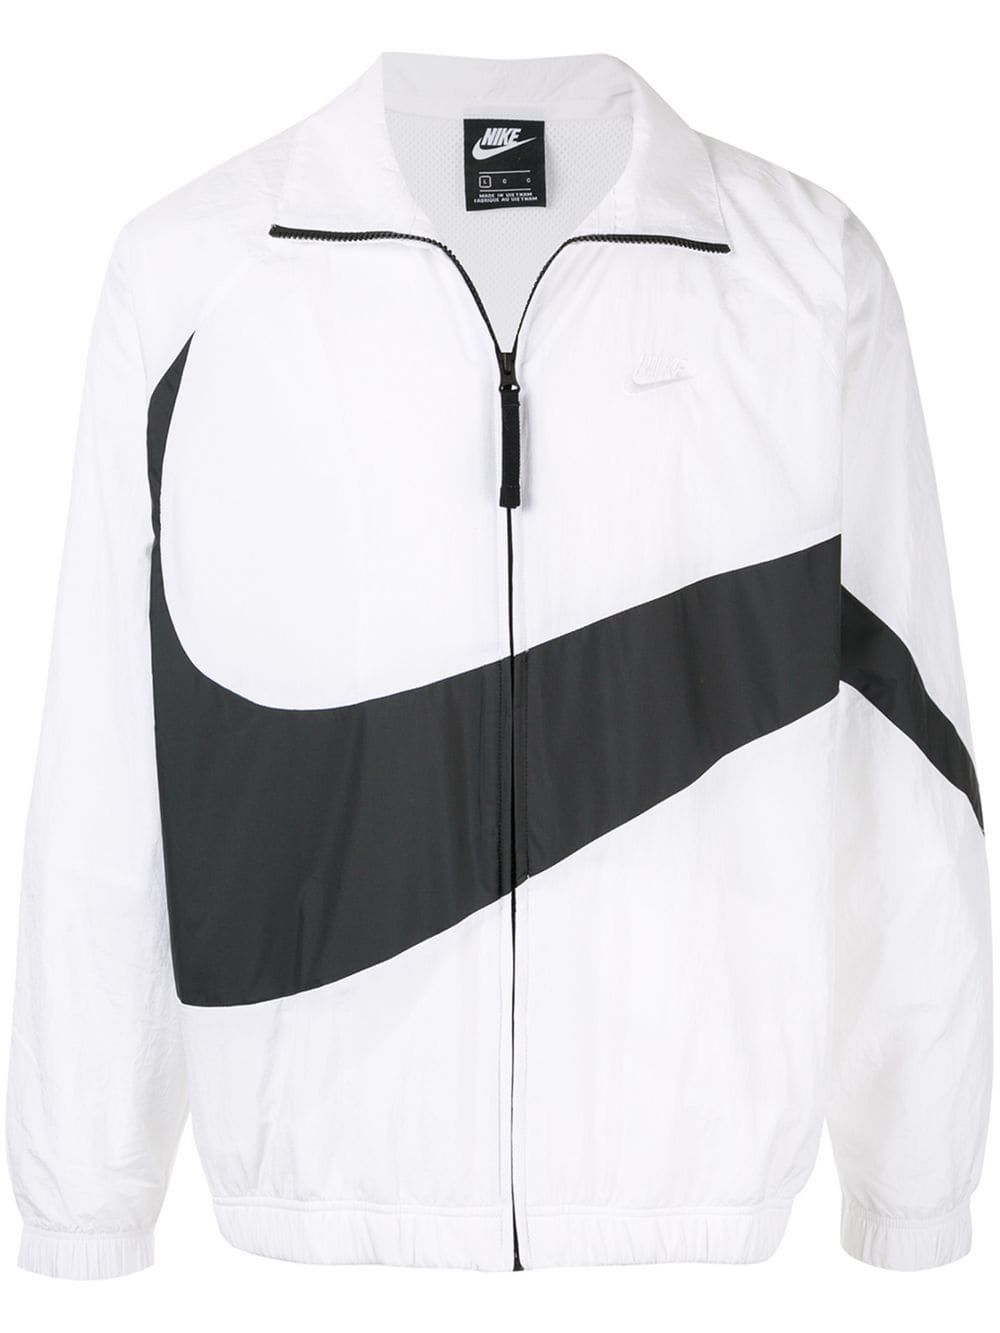 Nike Swoosh Print Track Jacket